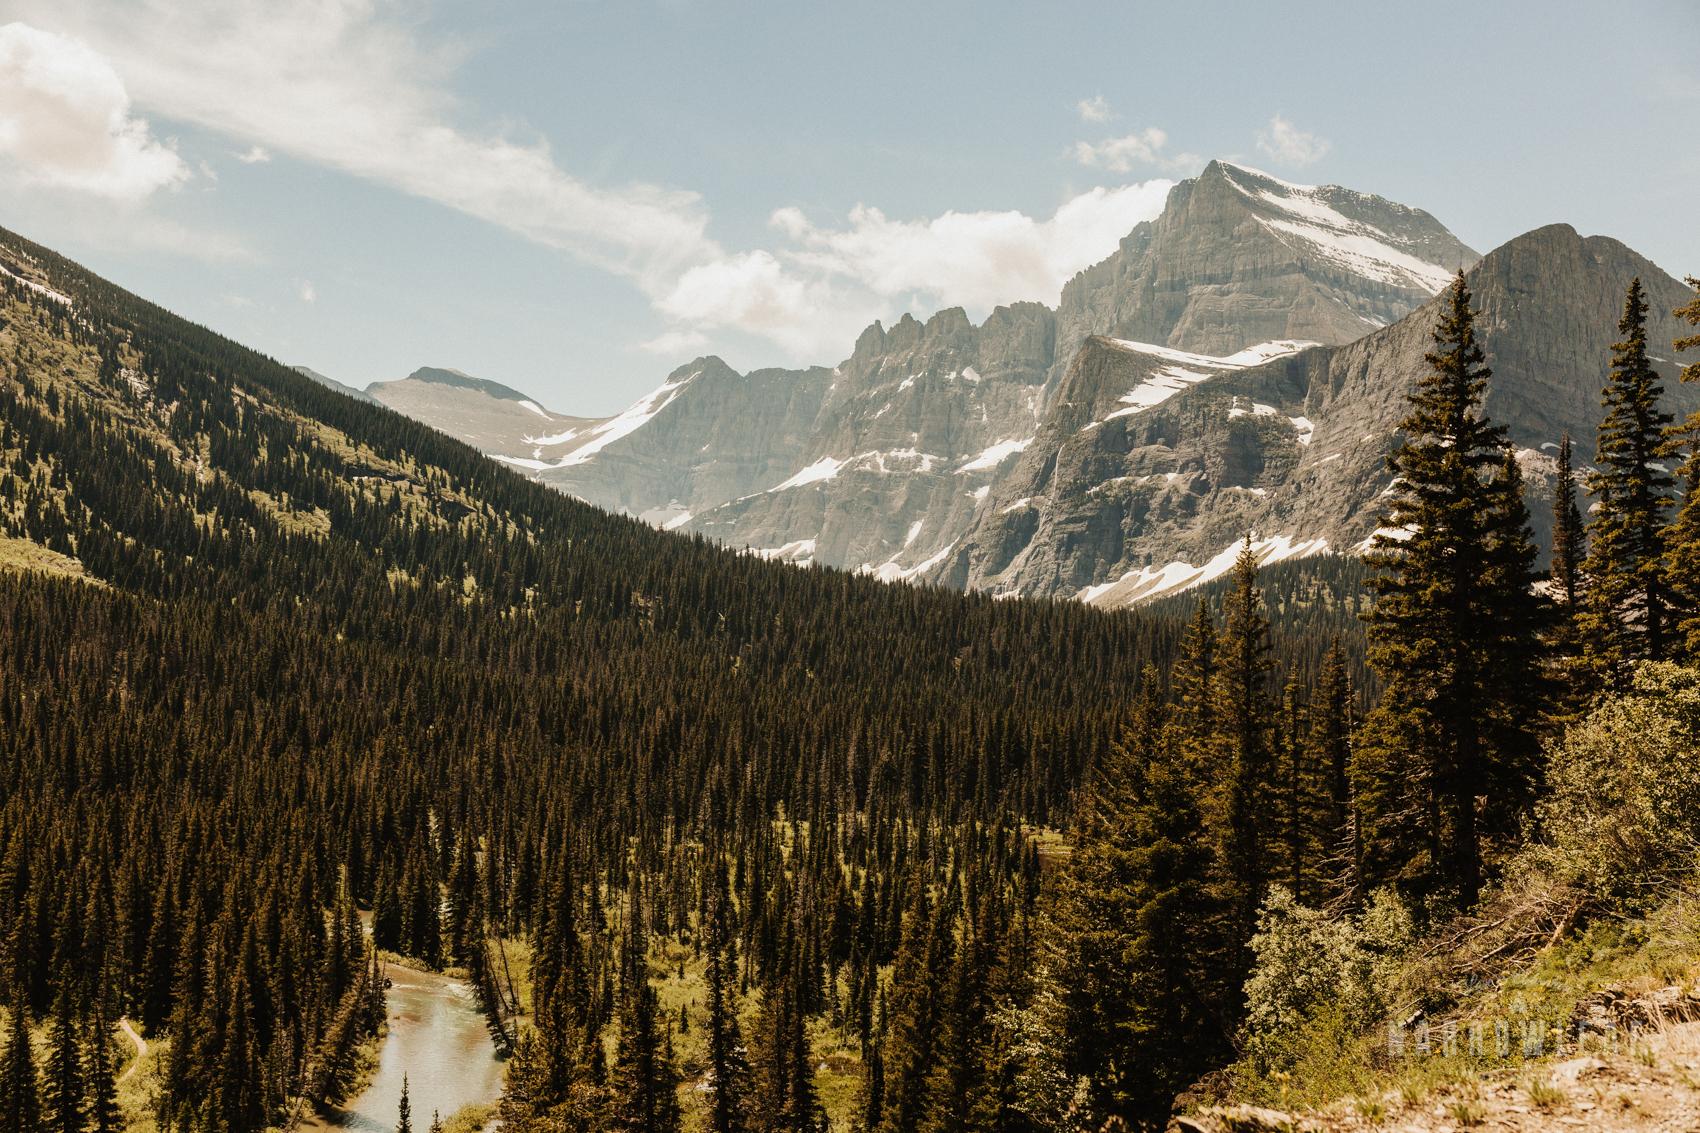 Montana-Glacier-National-Park-Many-Glacier-Narrowleaf-Love-and-Adventure-elopement-Photography-9485.jpg